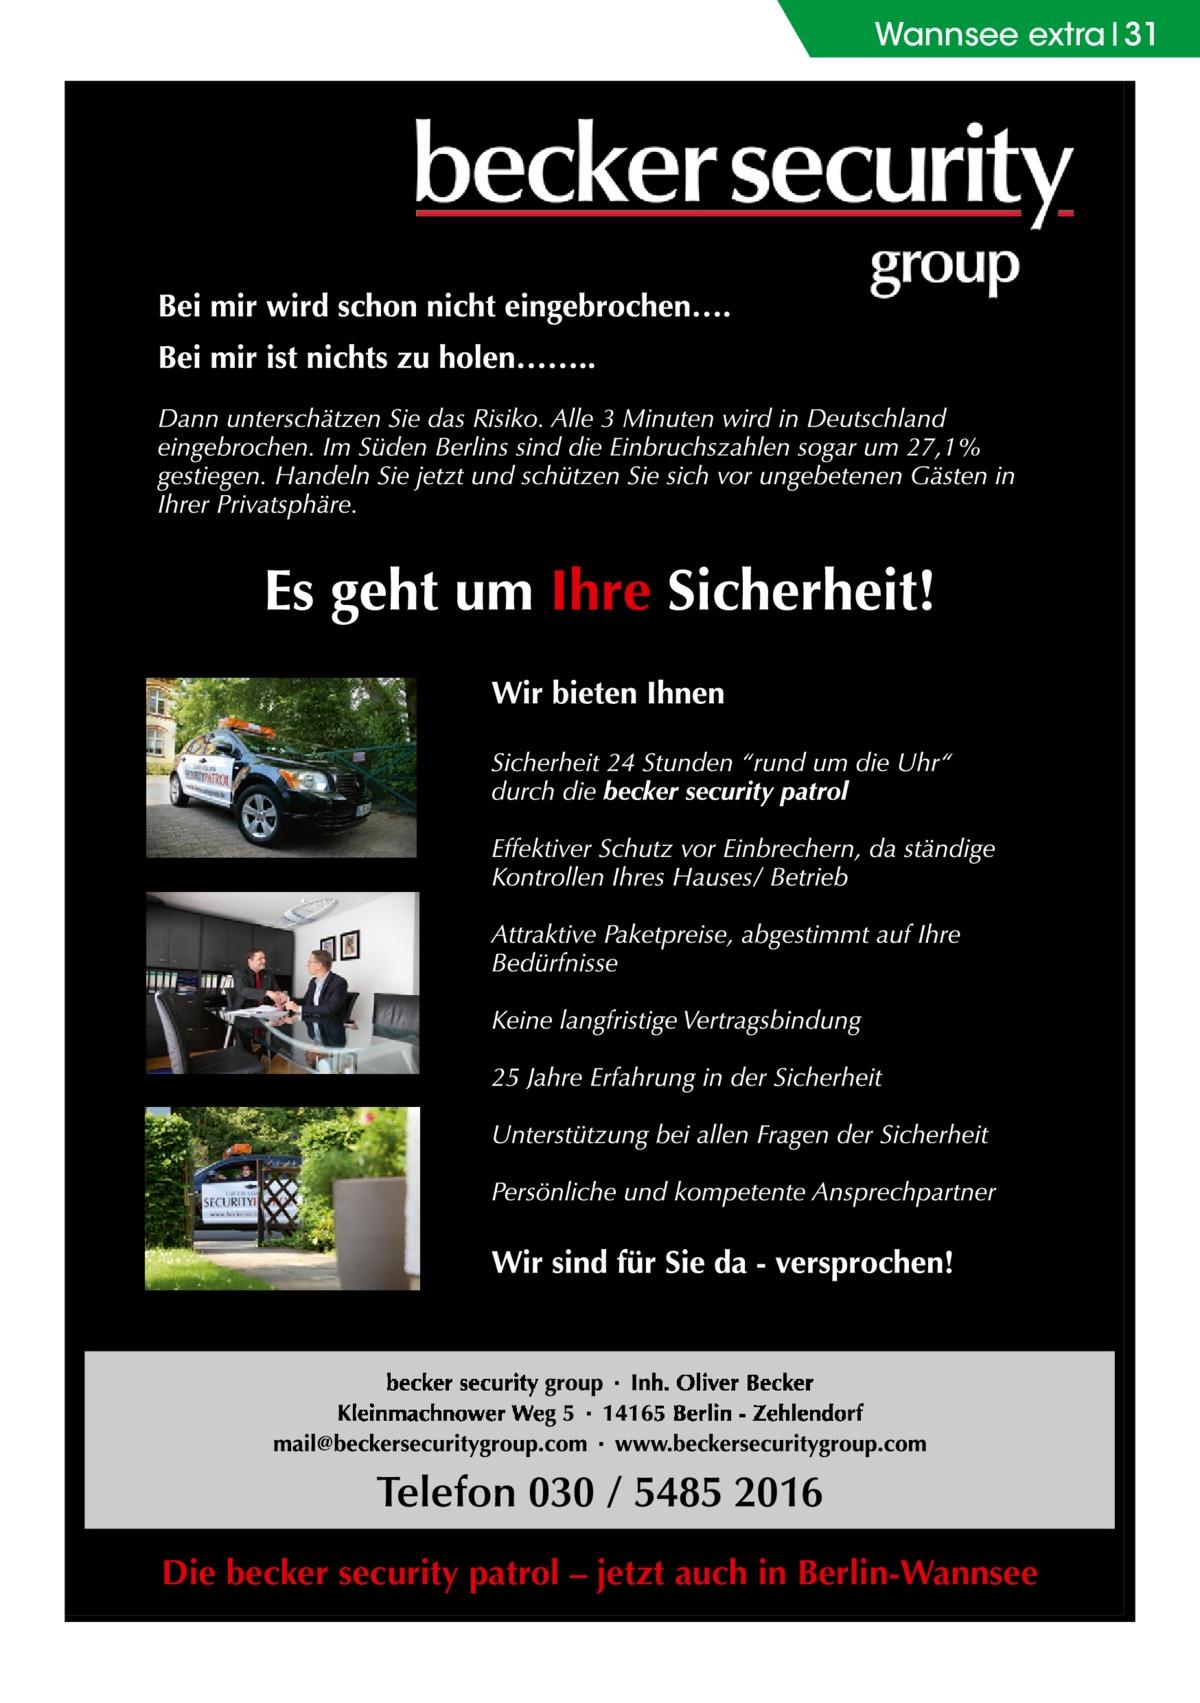 Wannsee extra 31  Die becker security patrol – jetzt auch in Berlin-Wannsee